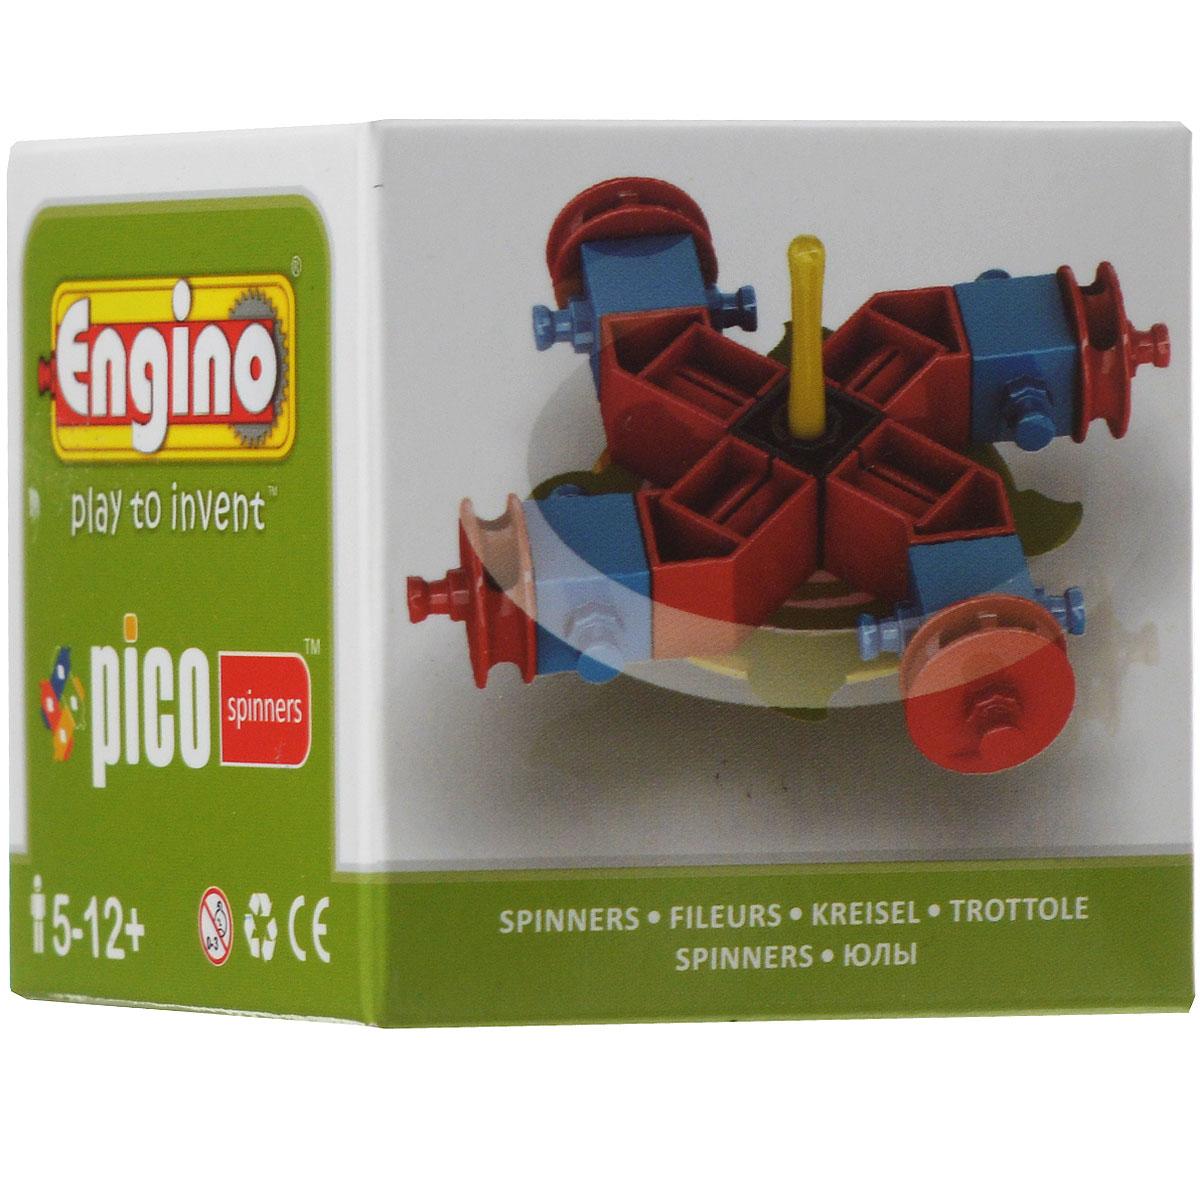 Engino Конструктор Spinners PS01 engino конструктор inventor приключения 170 элементов